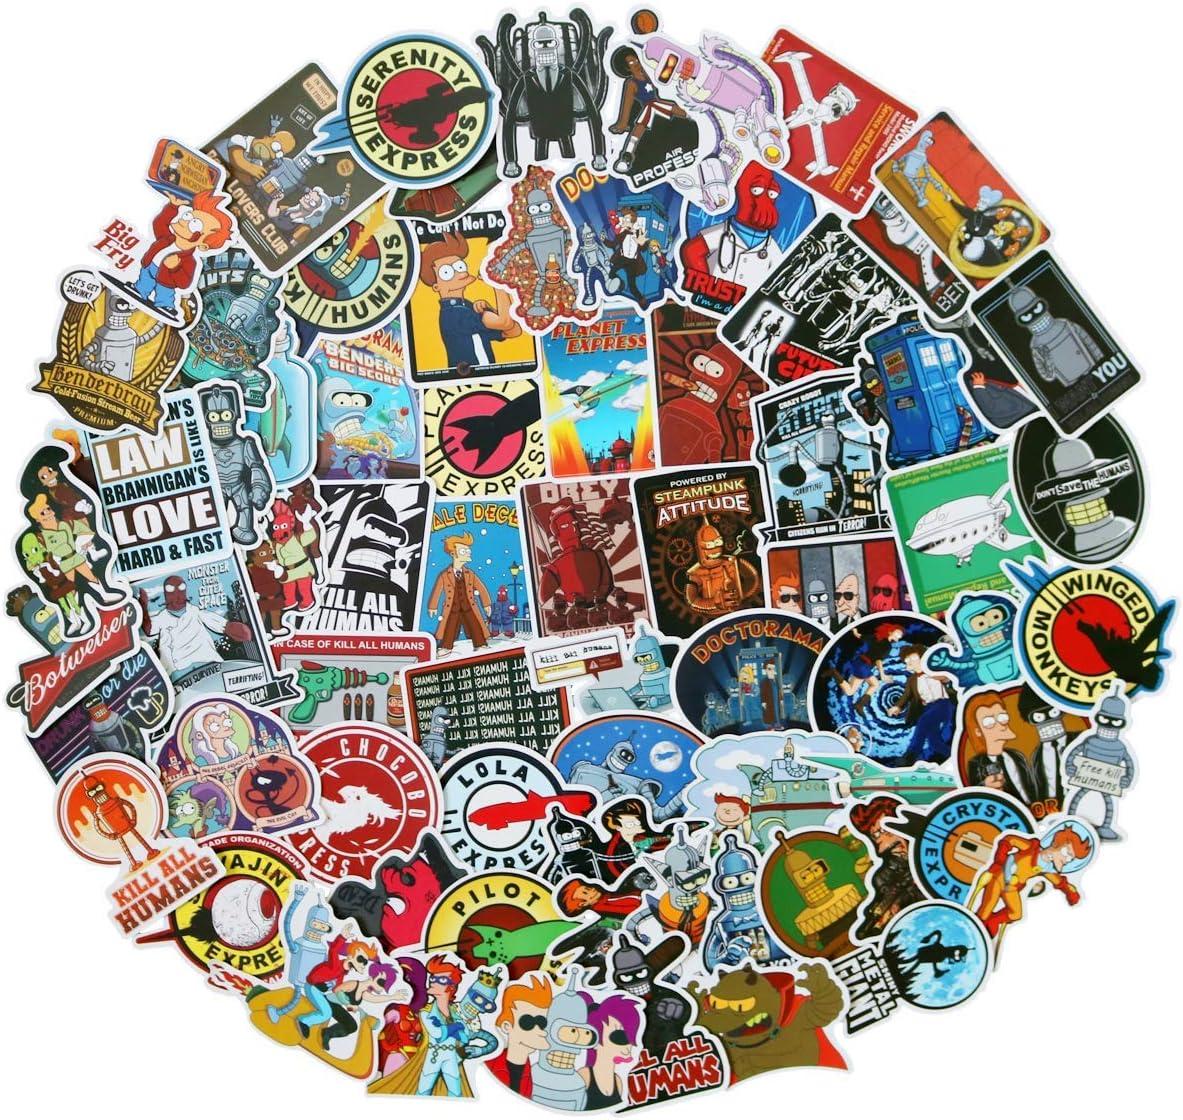 Philip J.Fry 74 pcs/Pack Futurama Stickers Variety Vinyl Car Sti